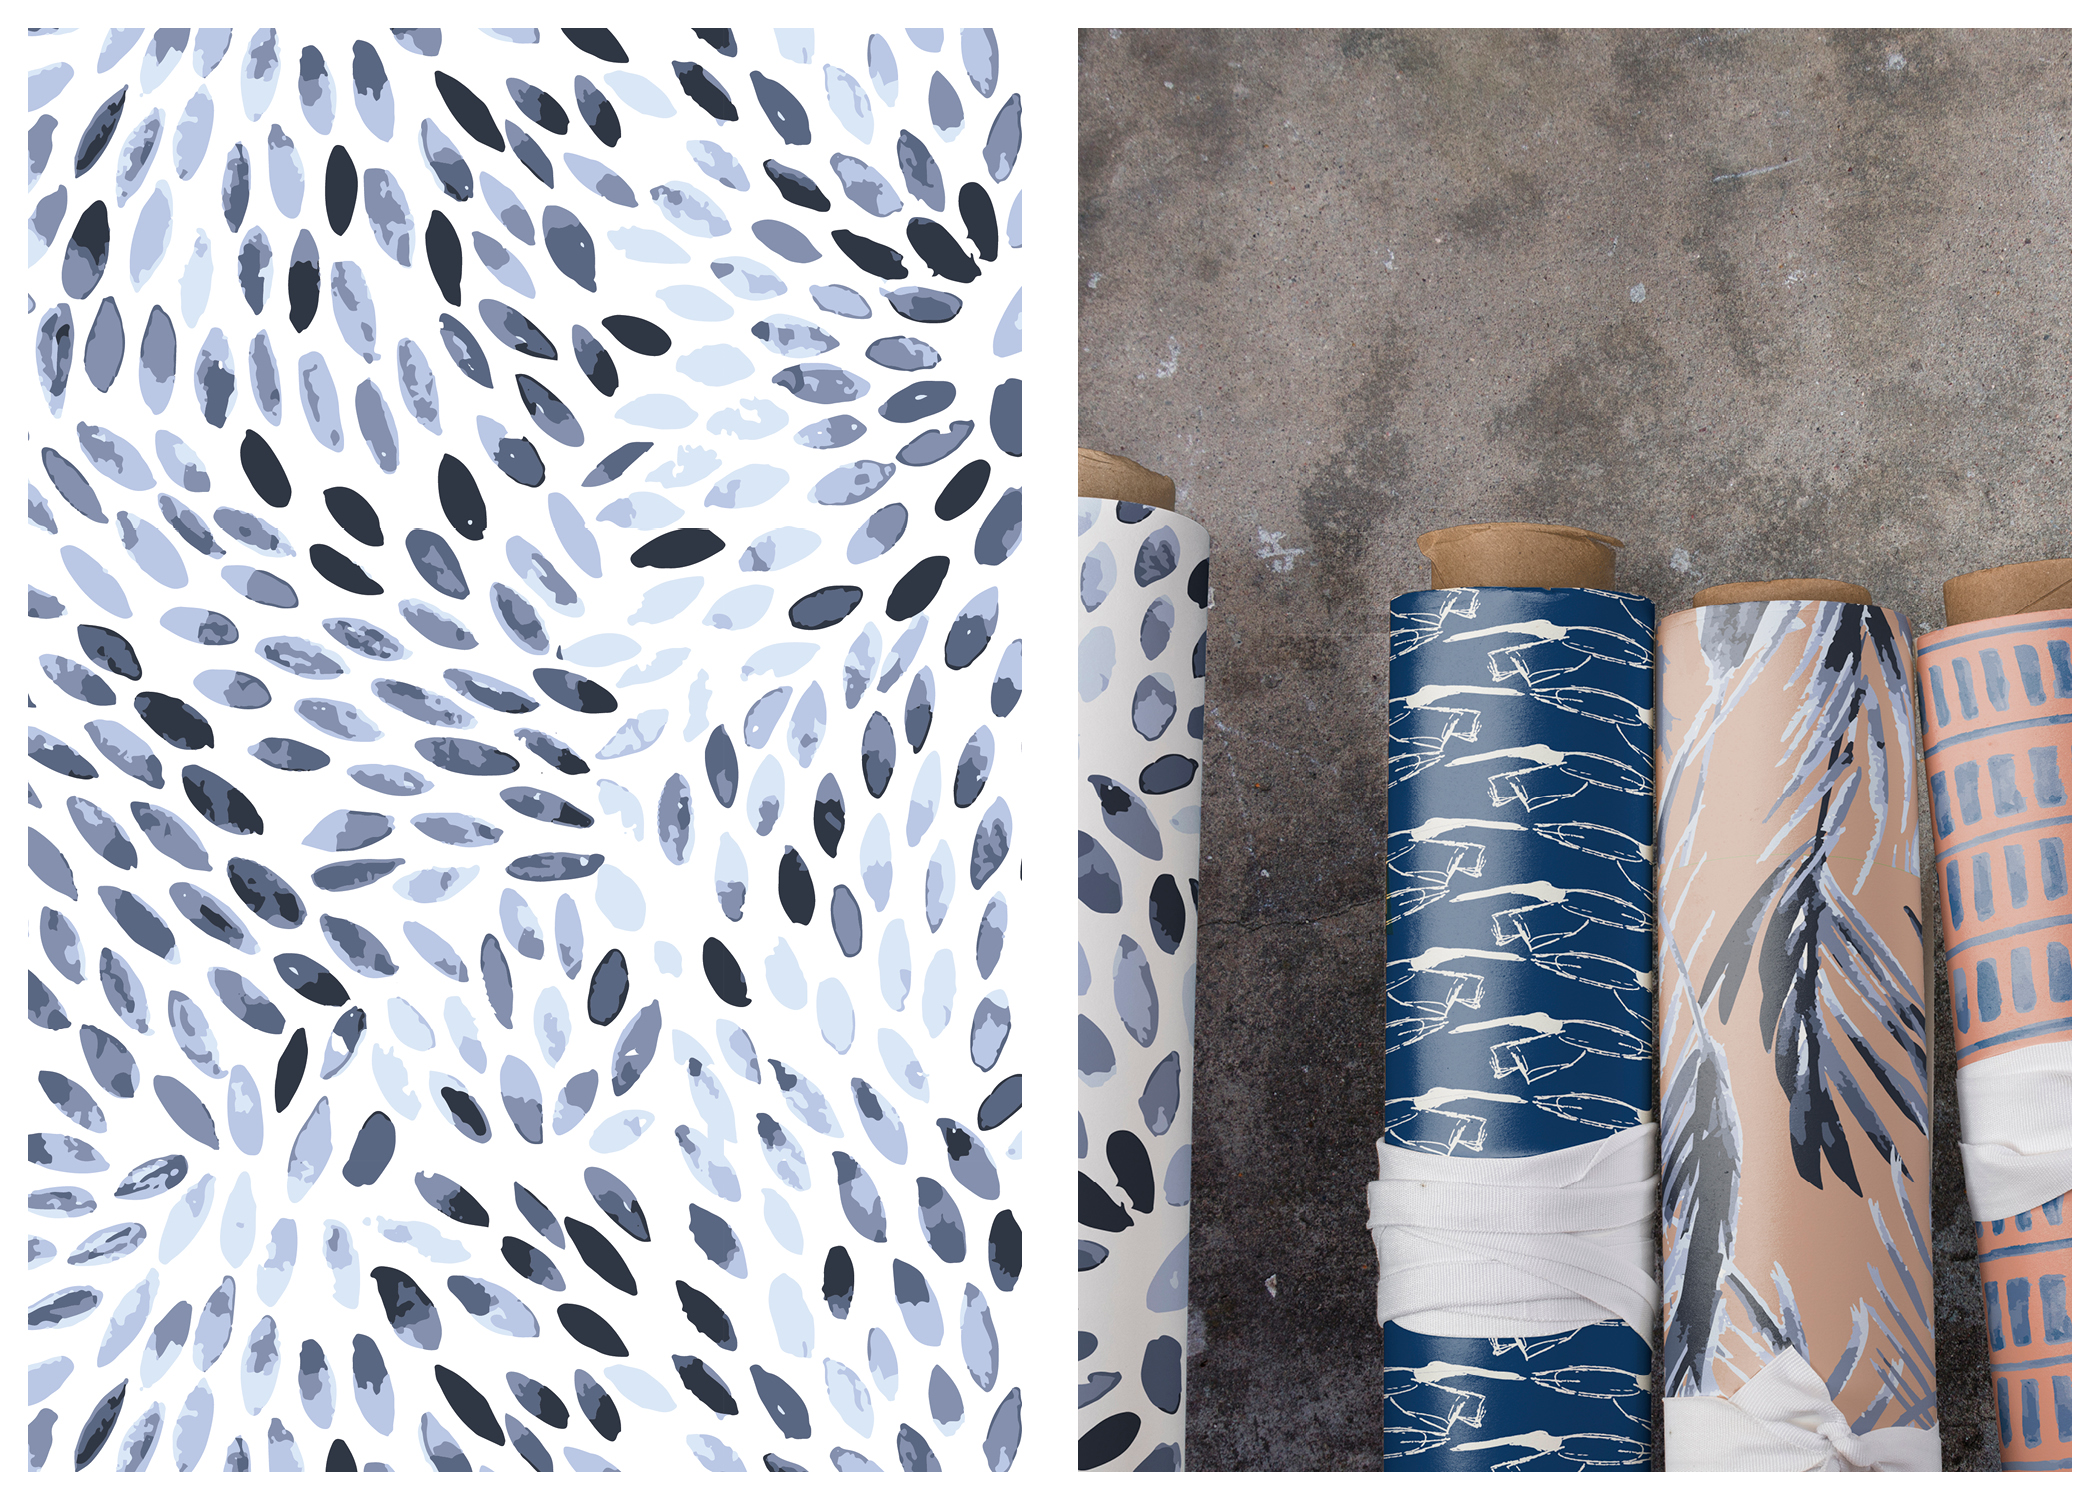 surface pattern design by HOPE johnson7.jpg